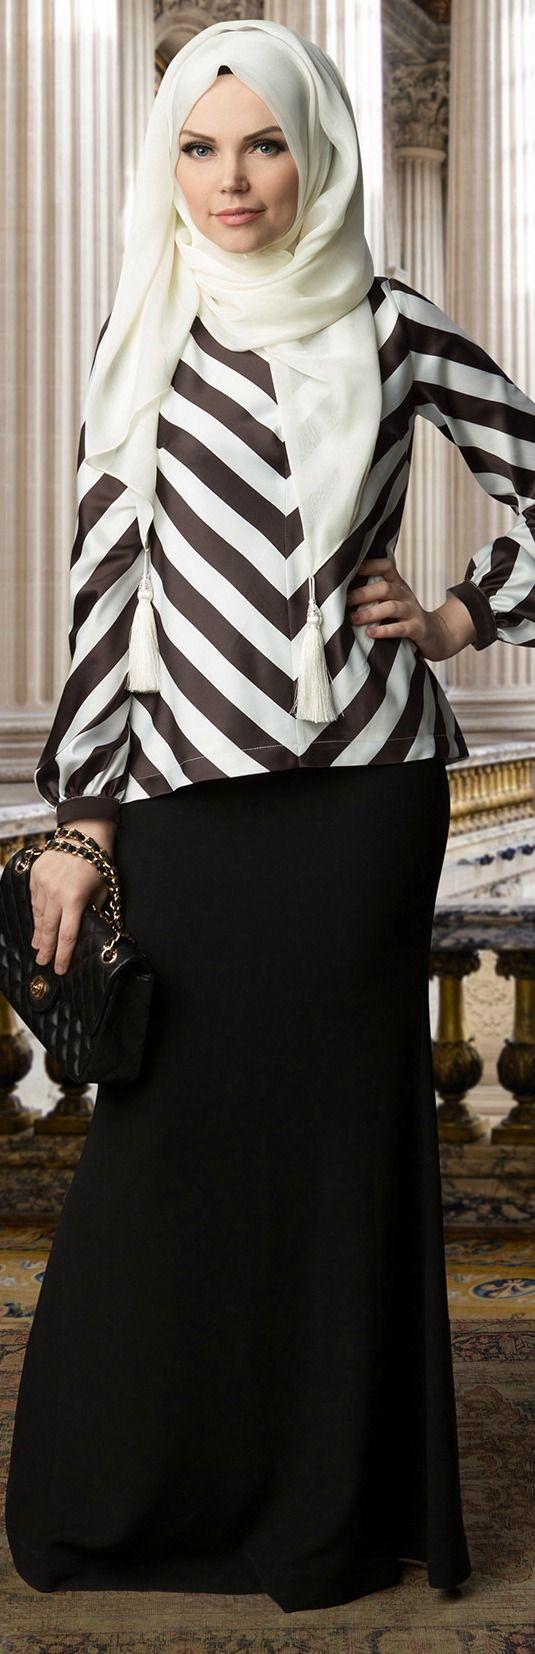 Muslima Wear Black Long Skirt                                                                                                                                                                                 More